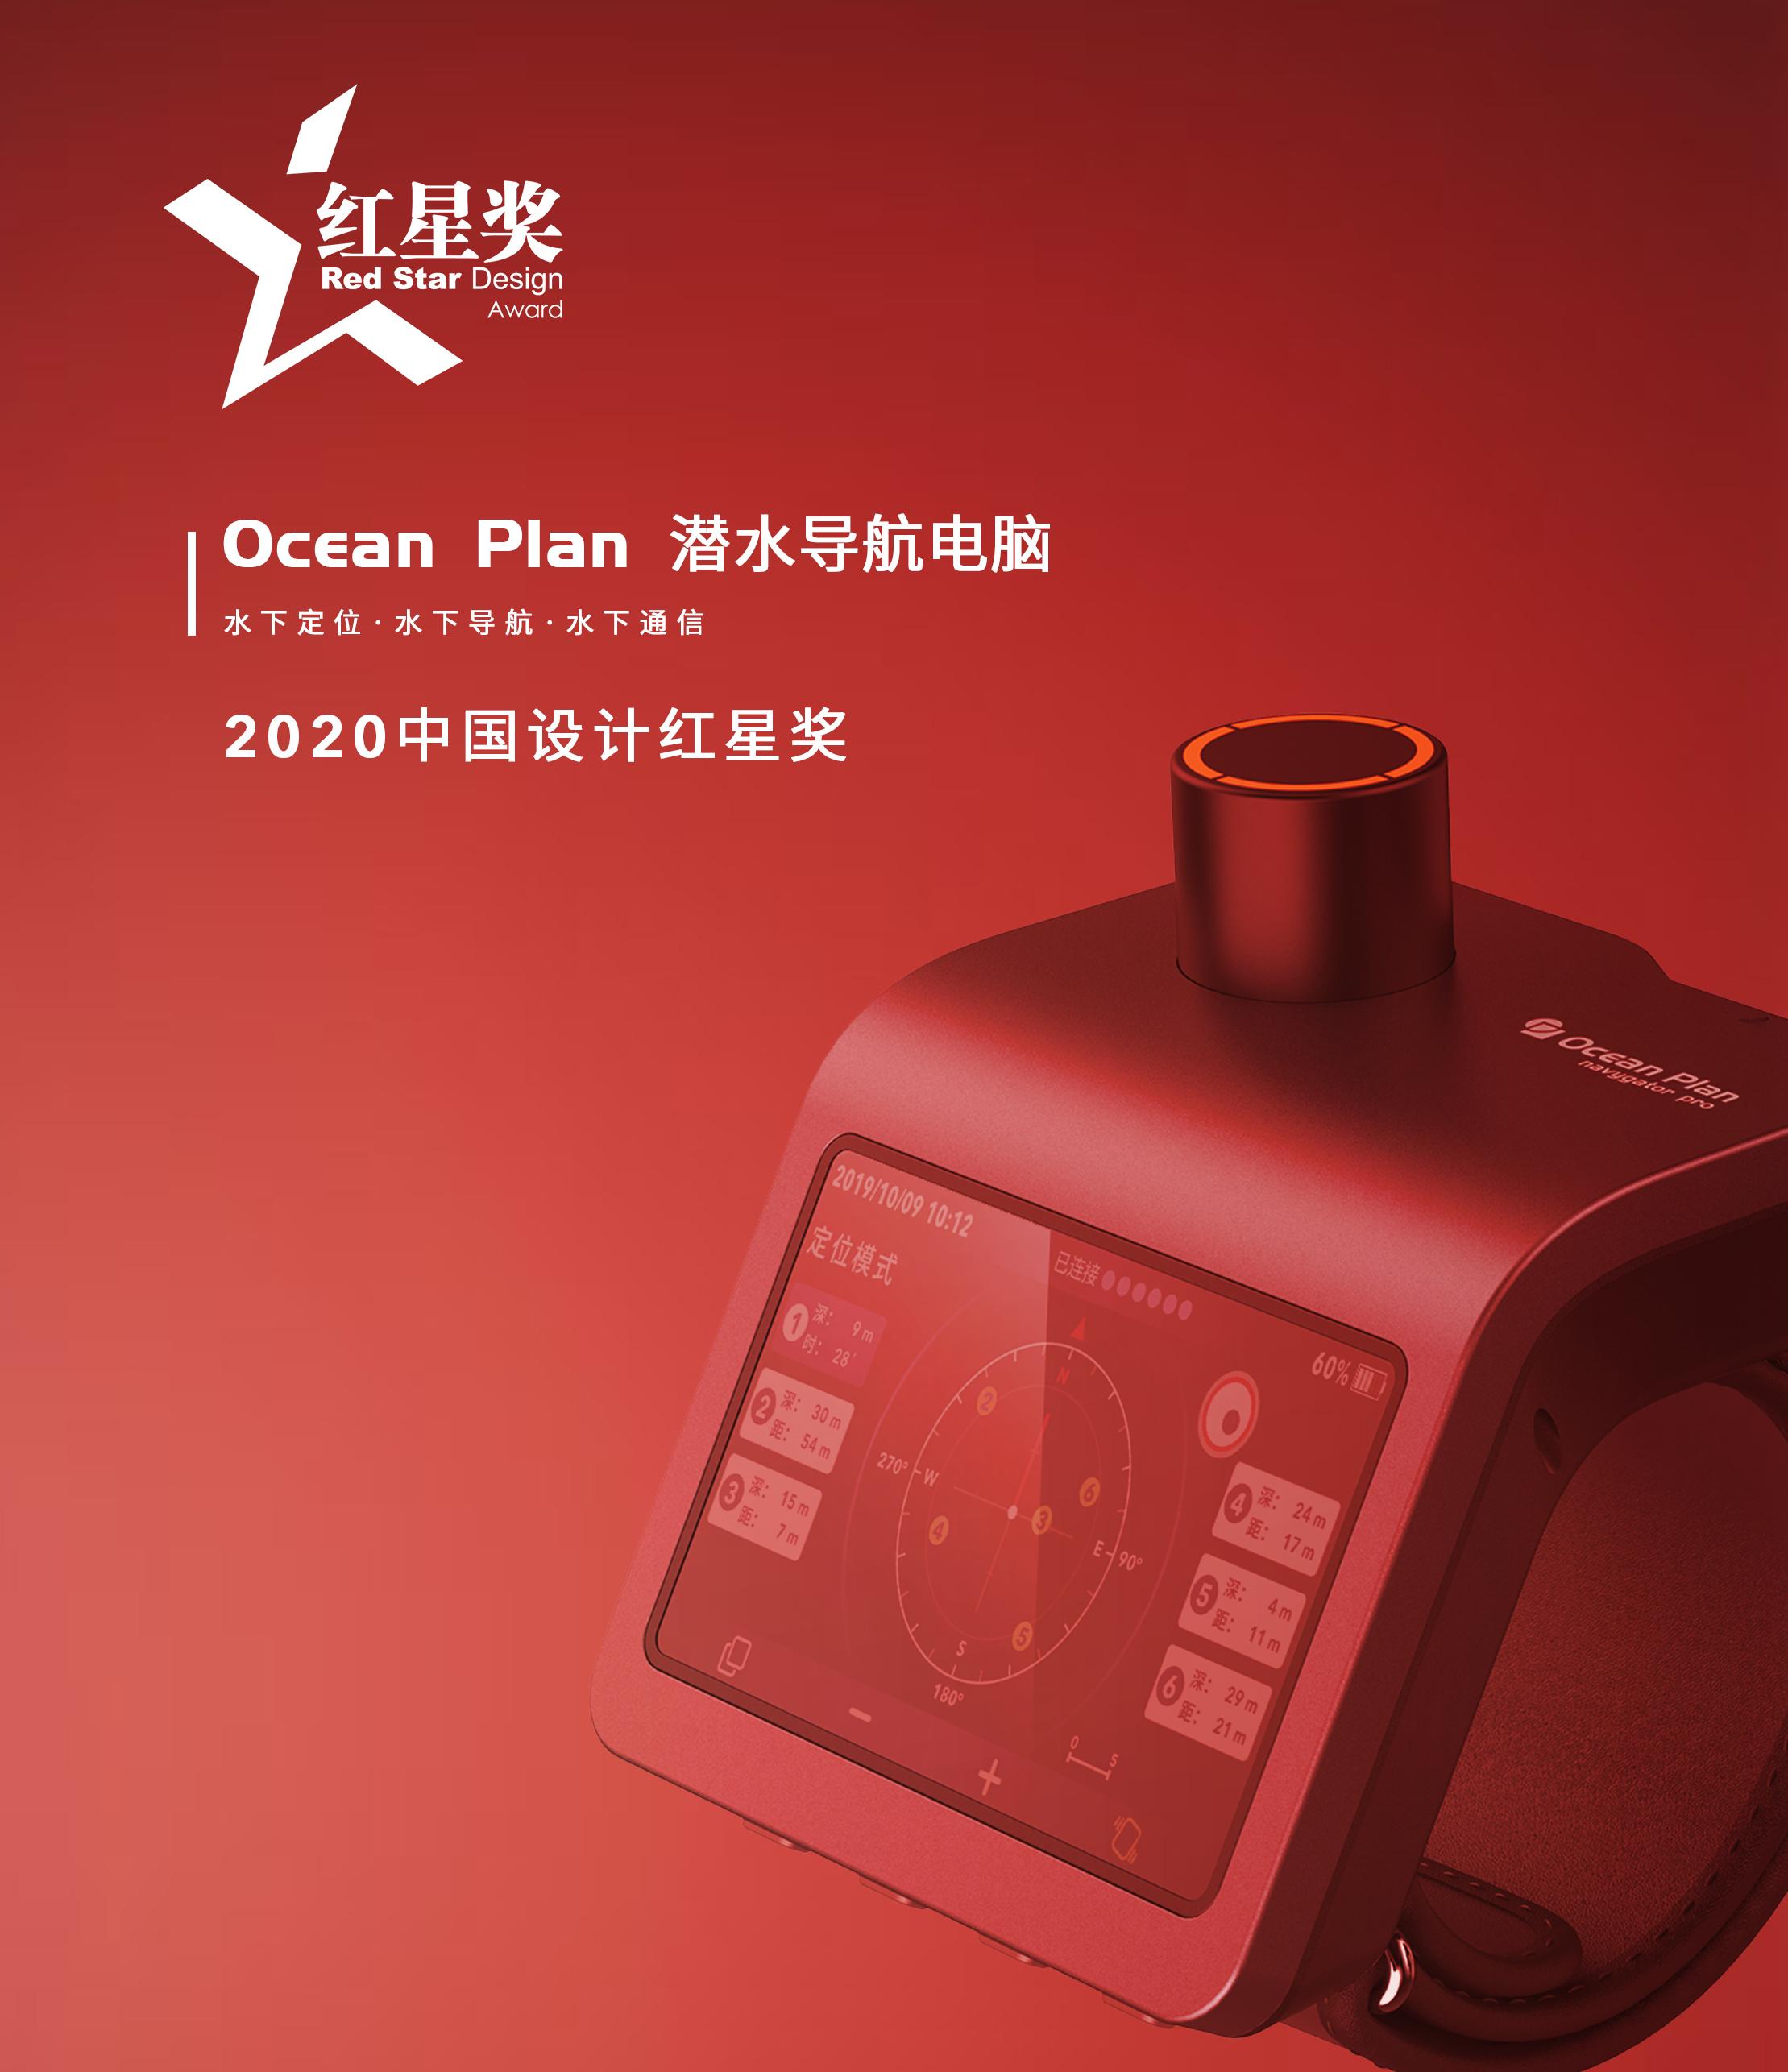 Ocean Plan斩获2020中国设计红星奖